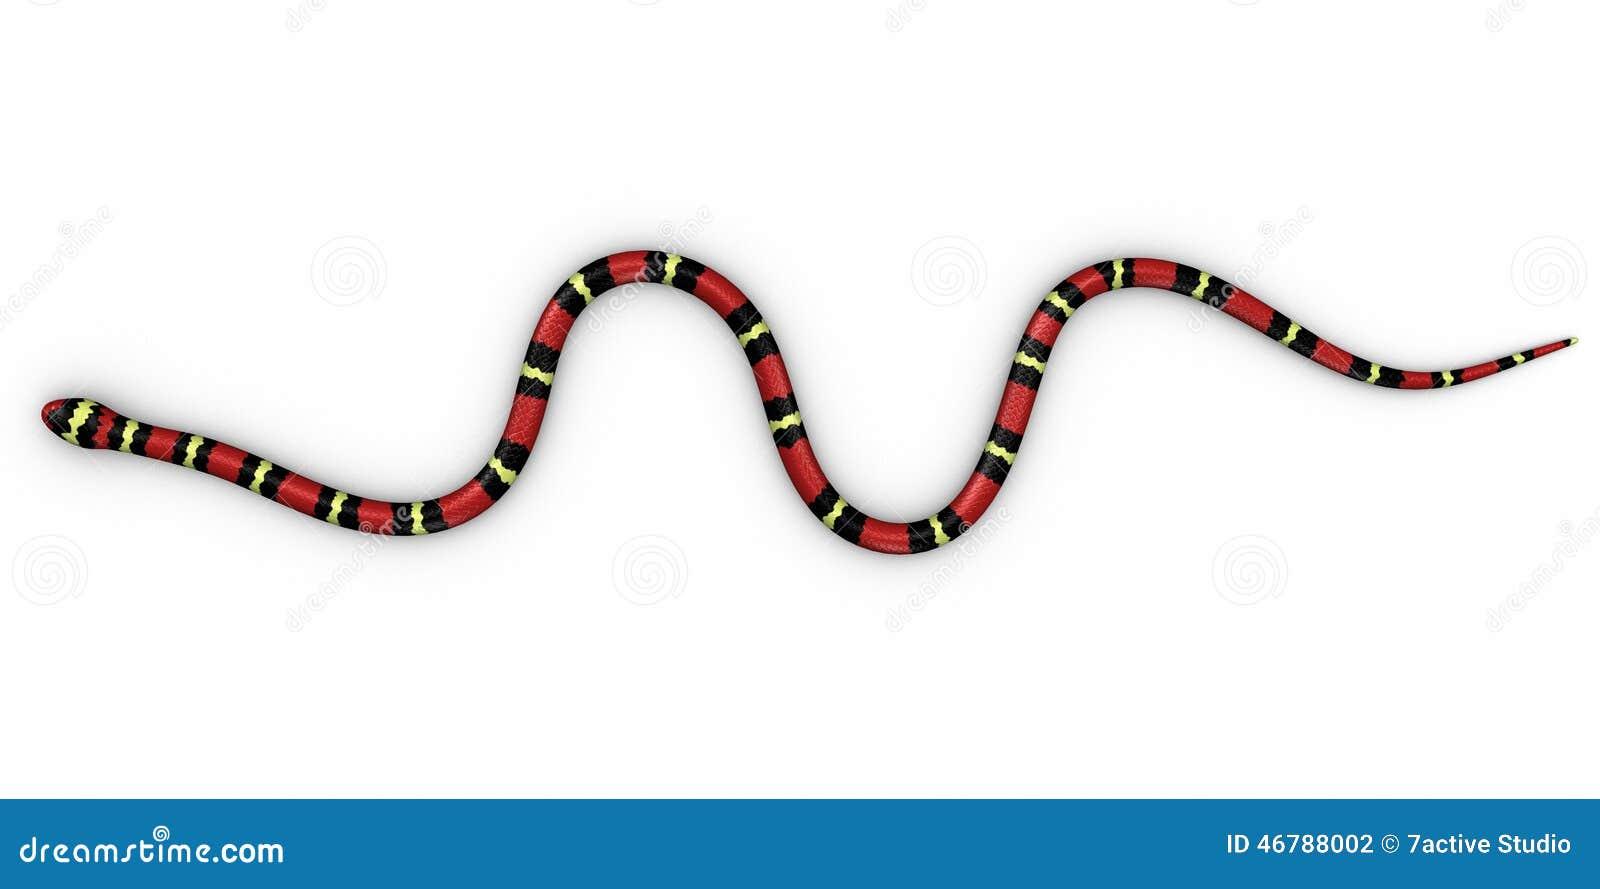 Coral snake stock illustration. Illustration of colorful - 46788002